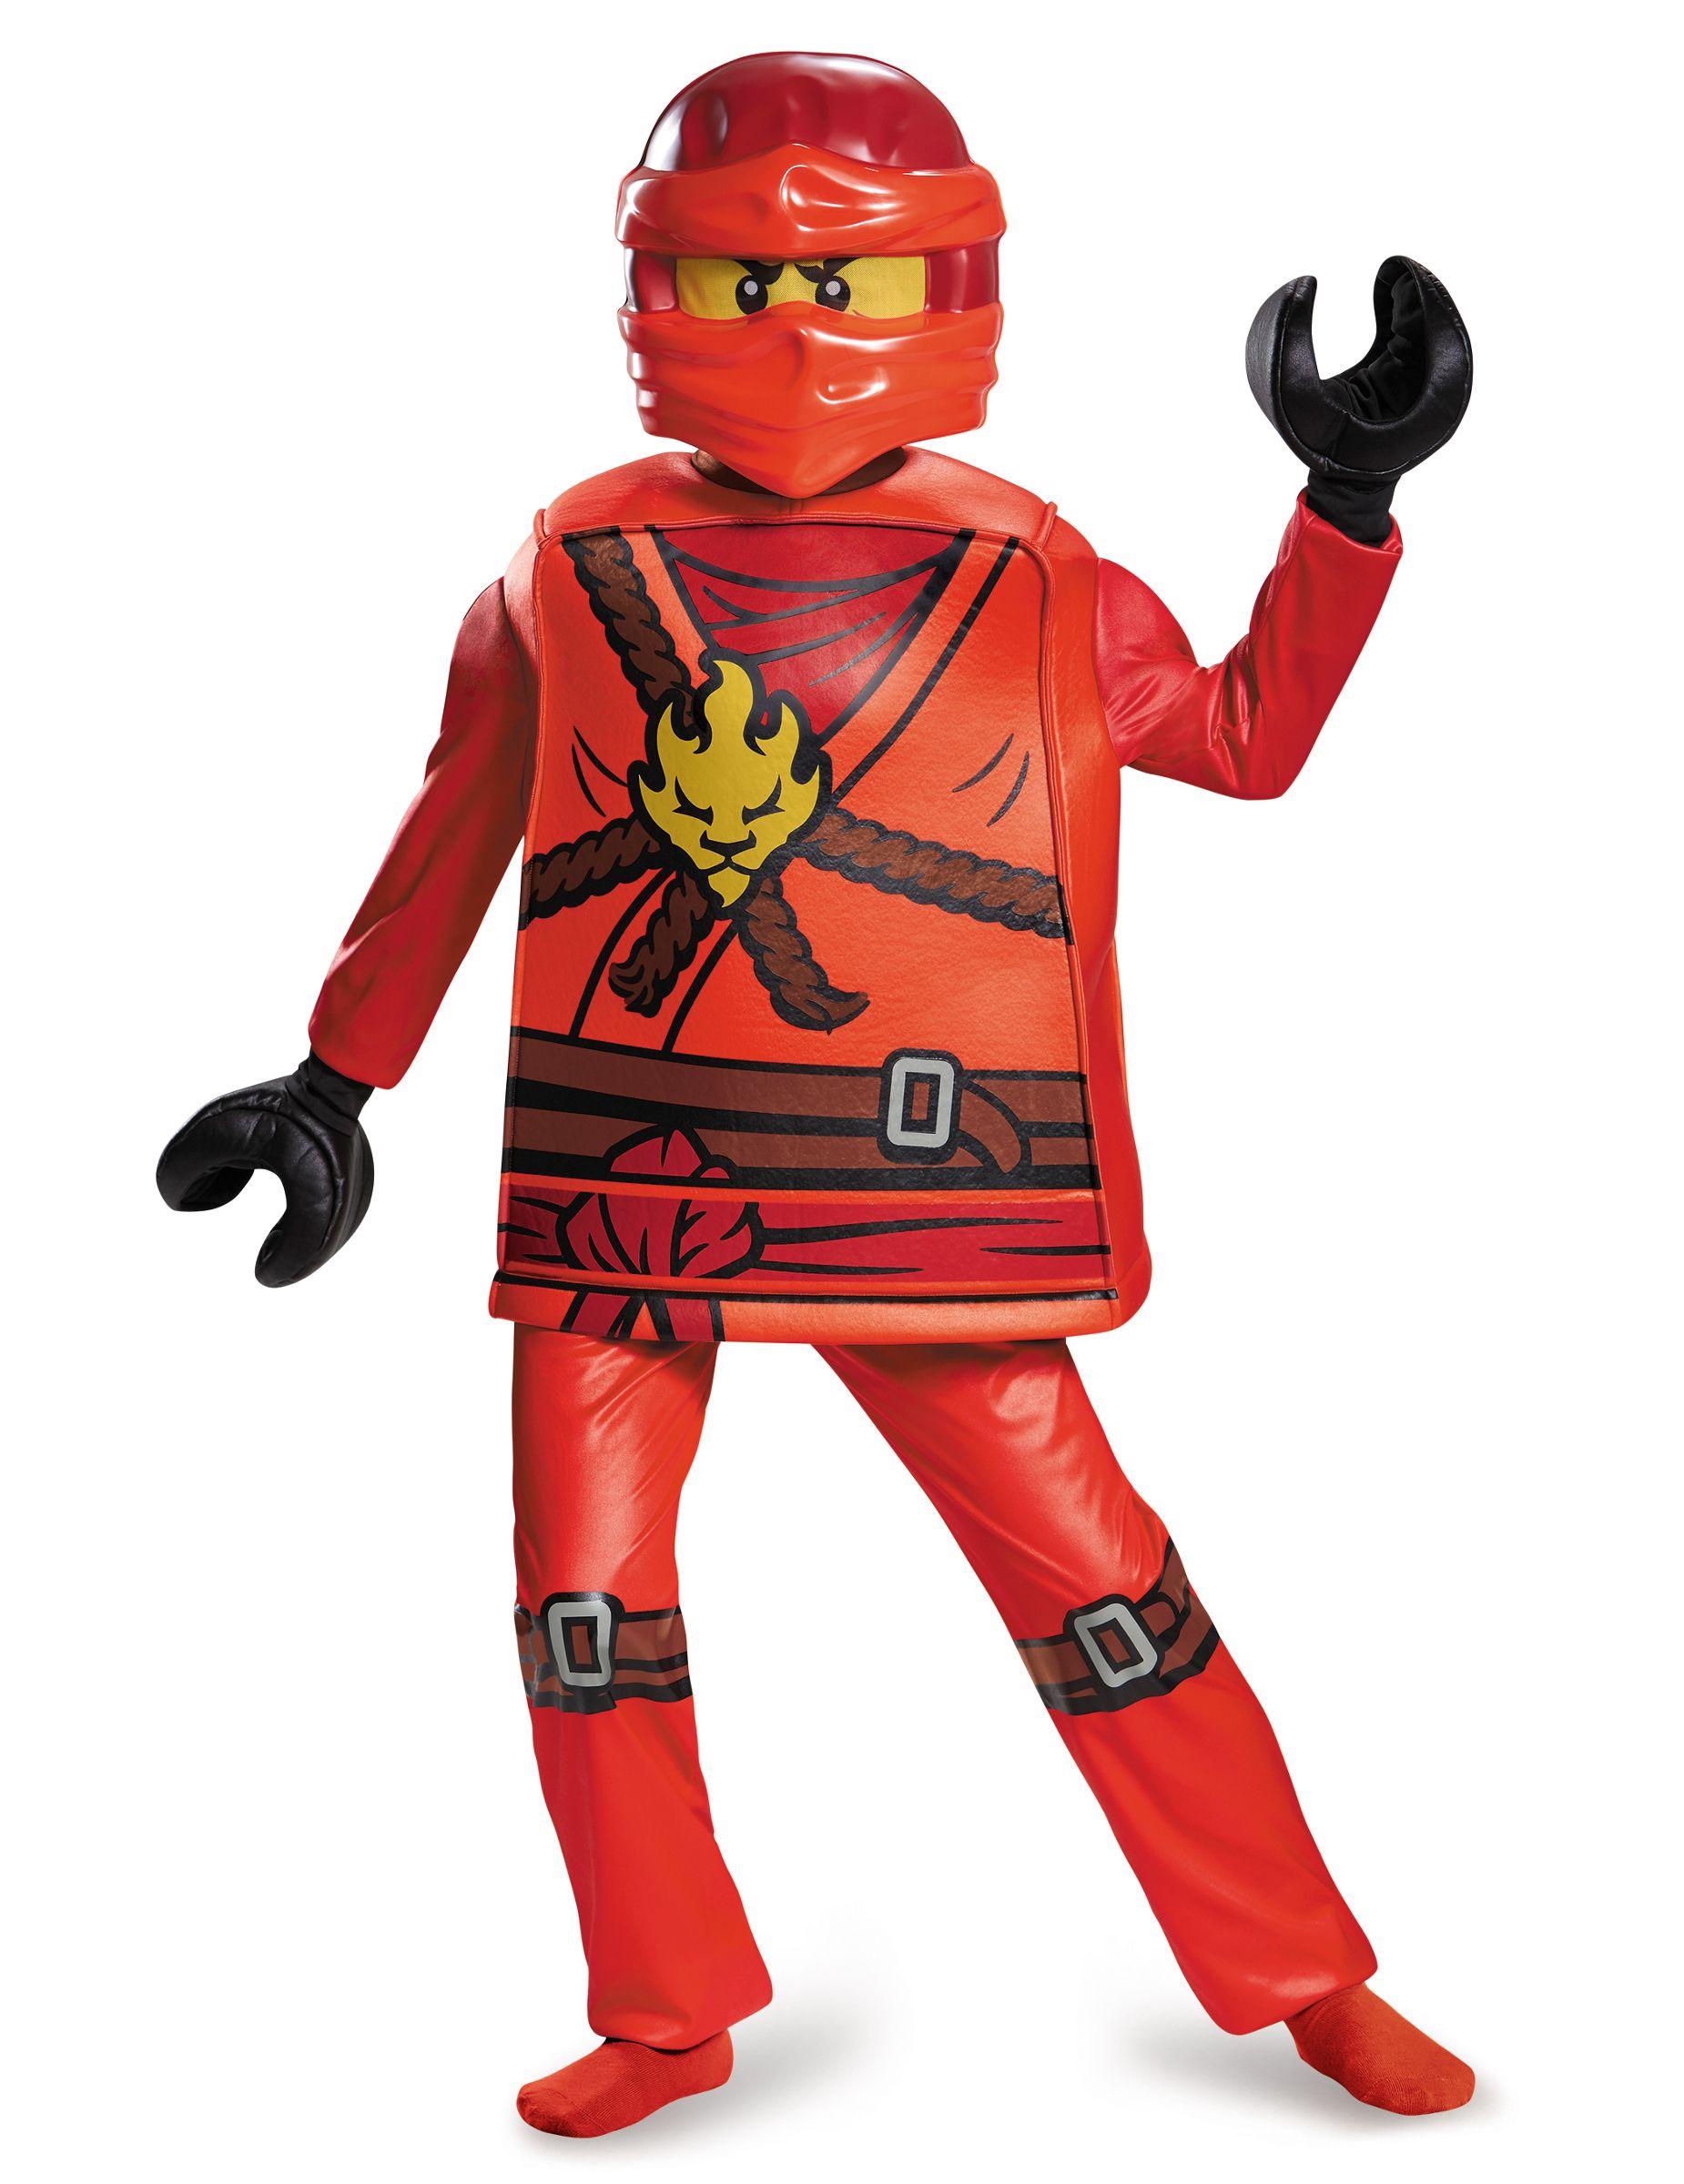 Exceptionnel Déguisement deluxe Kai Ninjago®- LEGO® enfant | Lego enfant, Lego  TH21